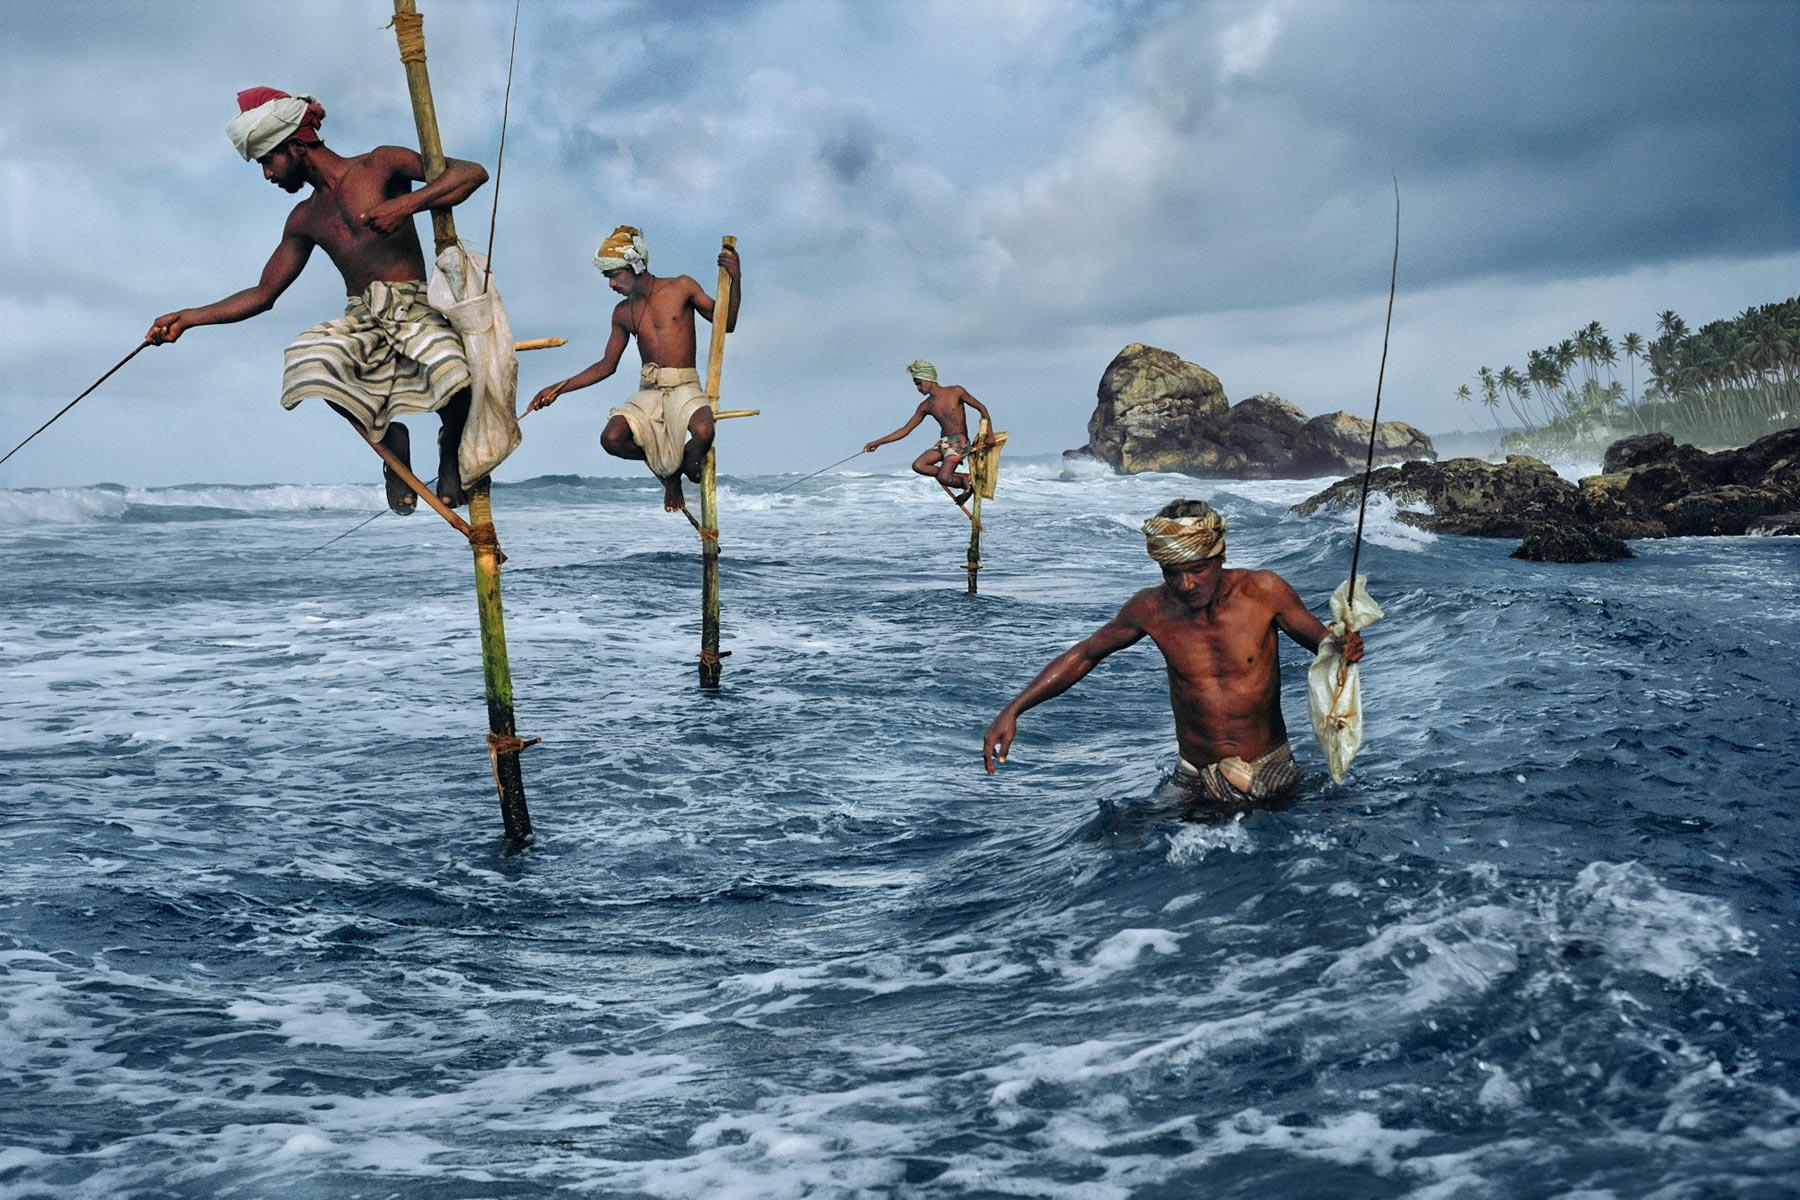 Weligama, Sri Lanka; By Steve McCurry